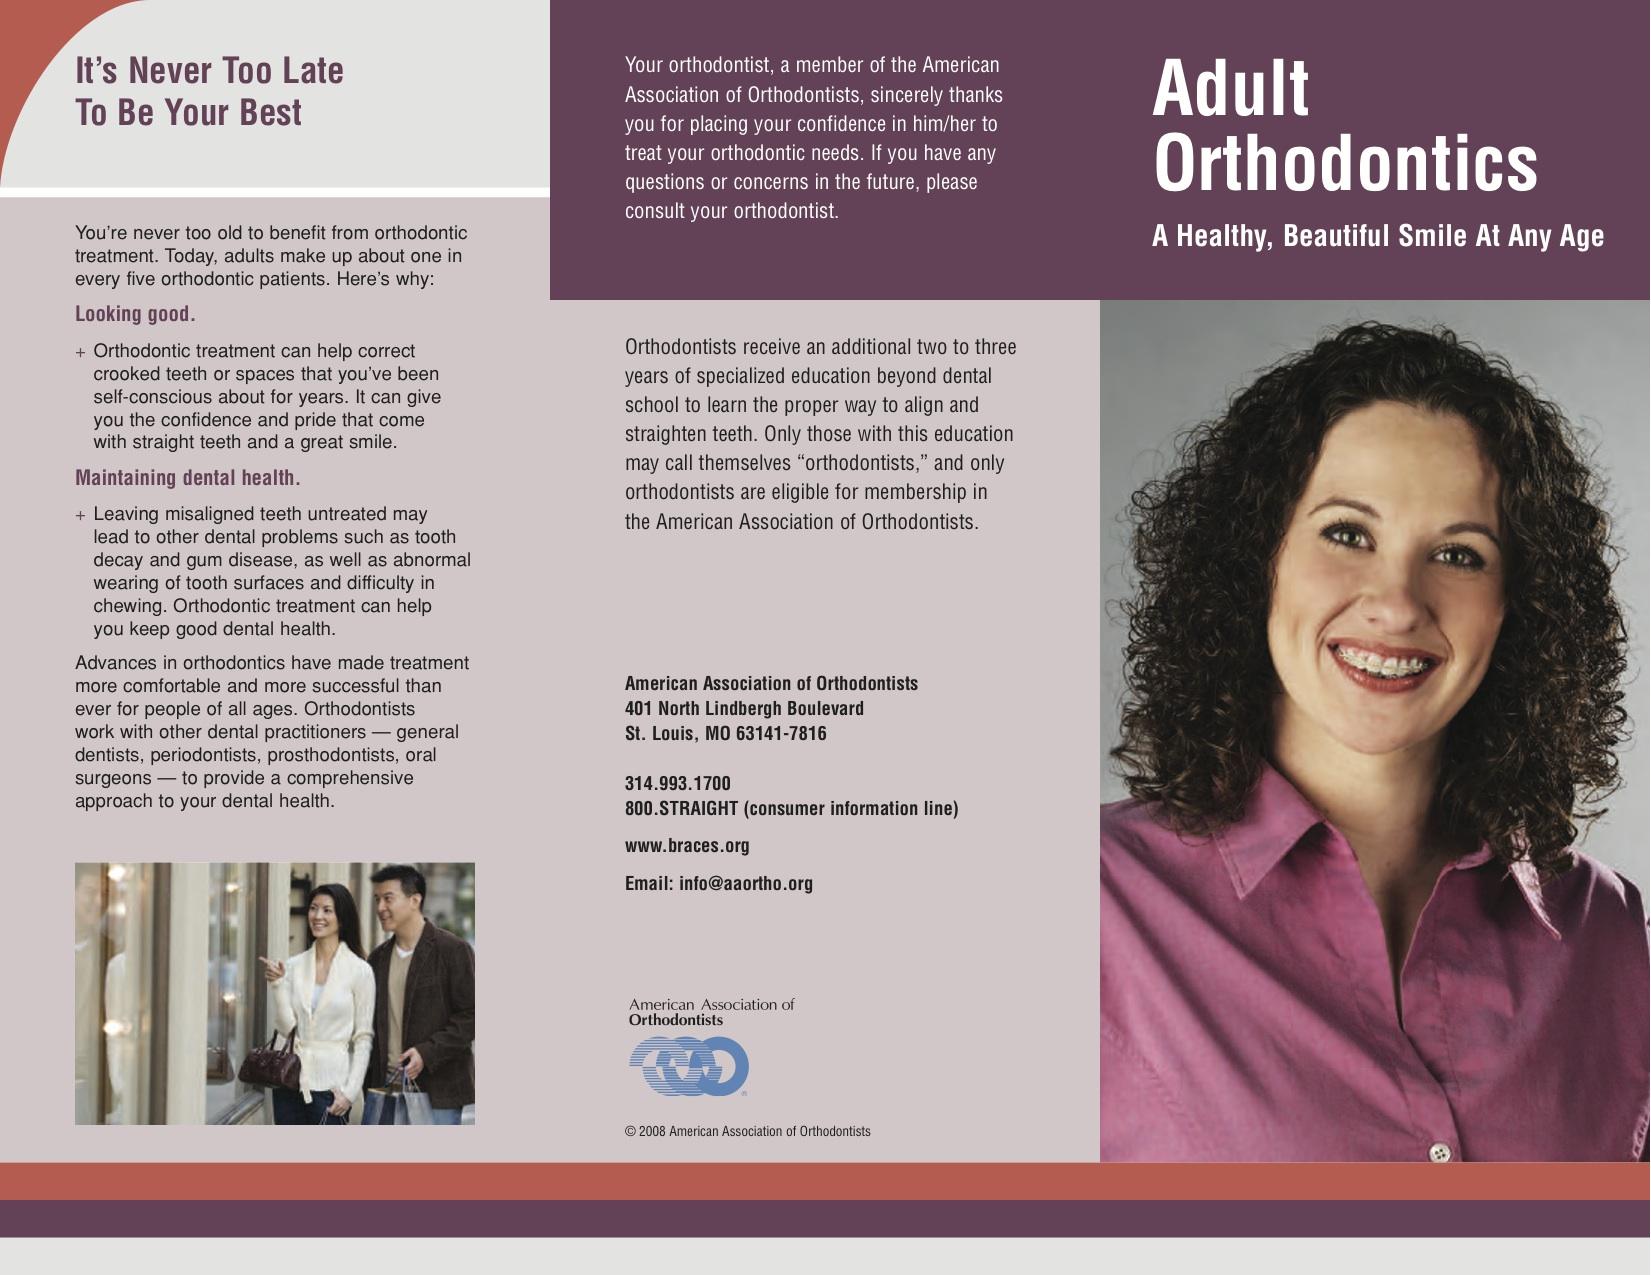 AAO- Adult Orthodontics